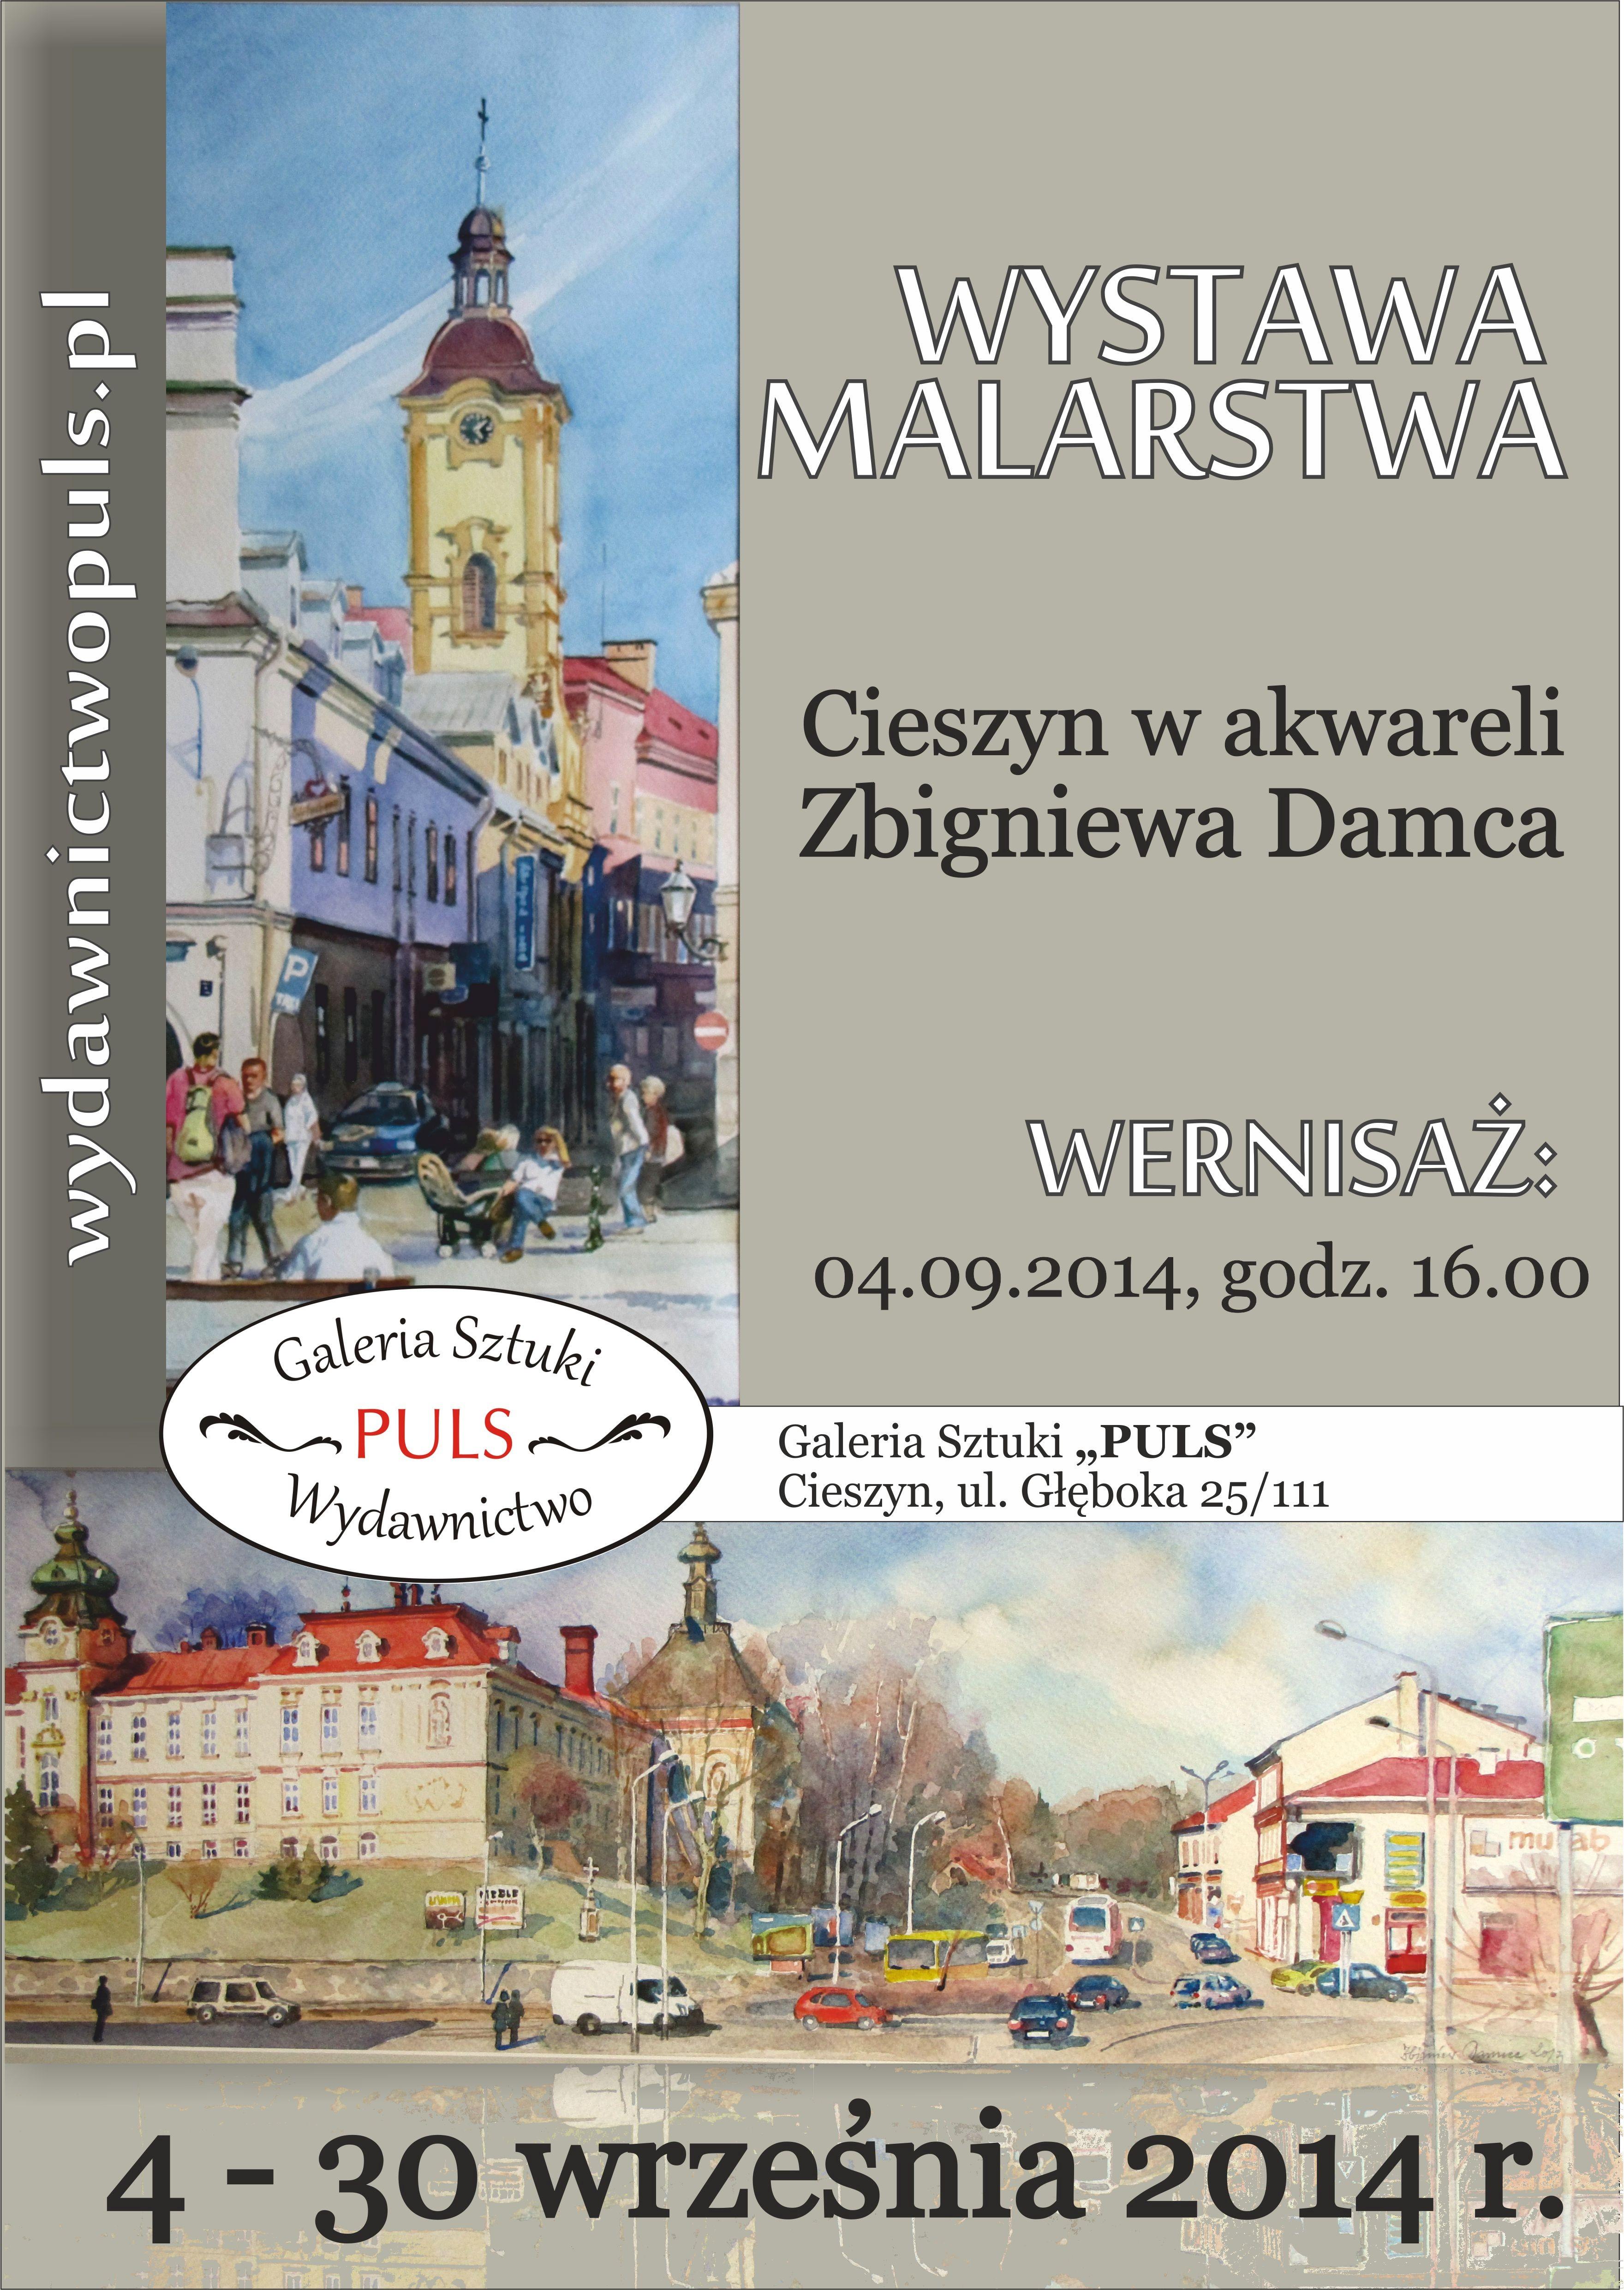 Akwarele Zbigniewa Damca